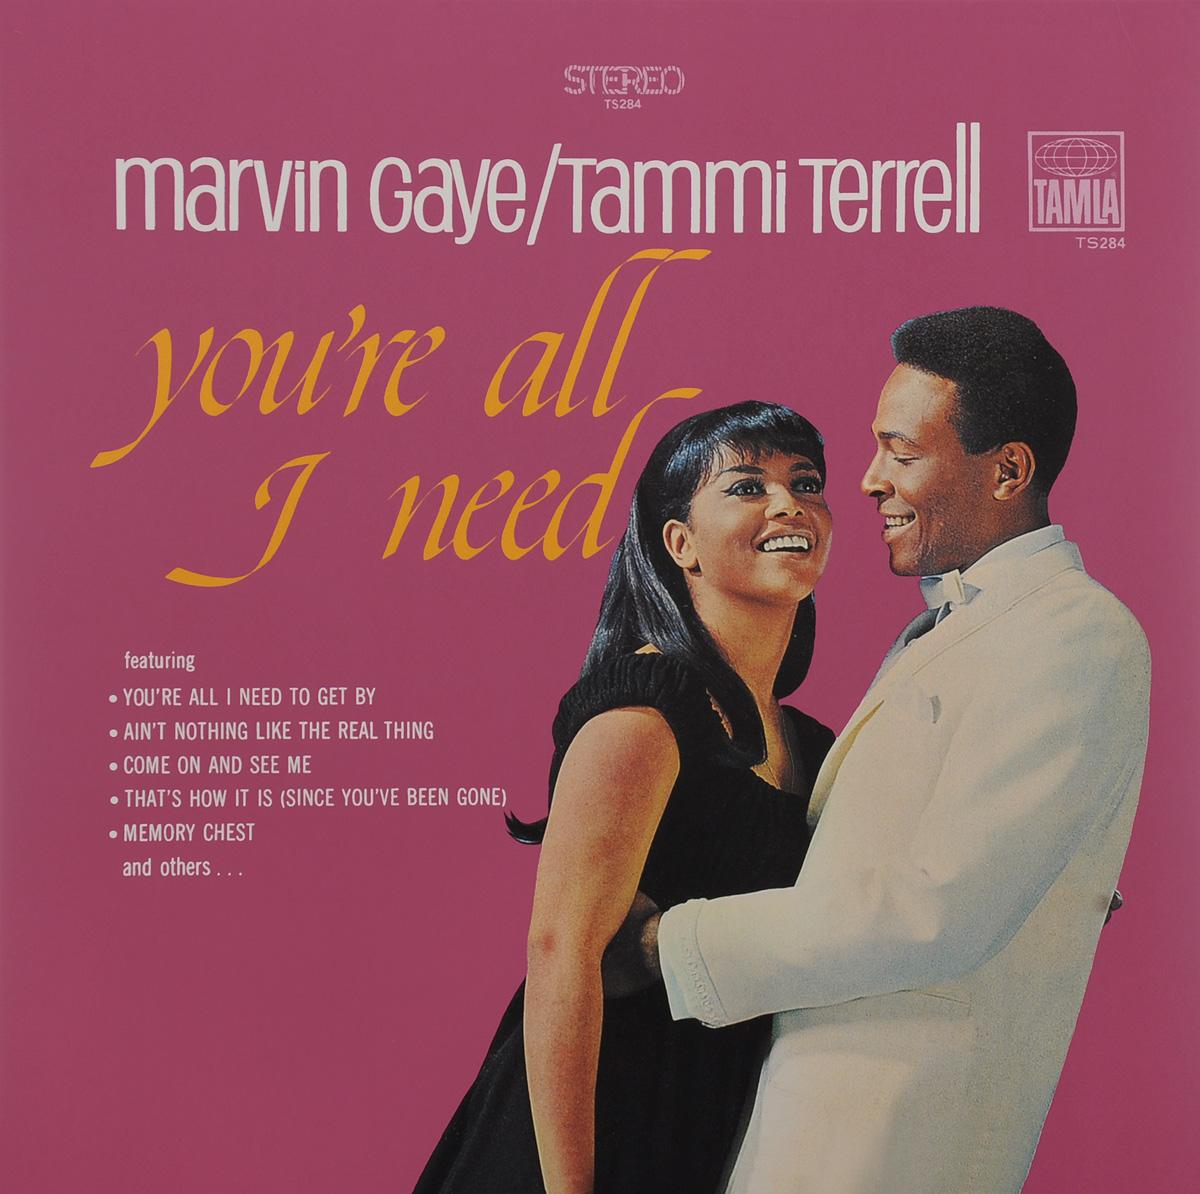 Марвин Гэй,Тамми Тэррелл Marvin Gaye & Tammi Terrell. You're All I Need (LP) marvin gaye marvin gaye here my dear 2 lp